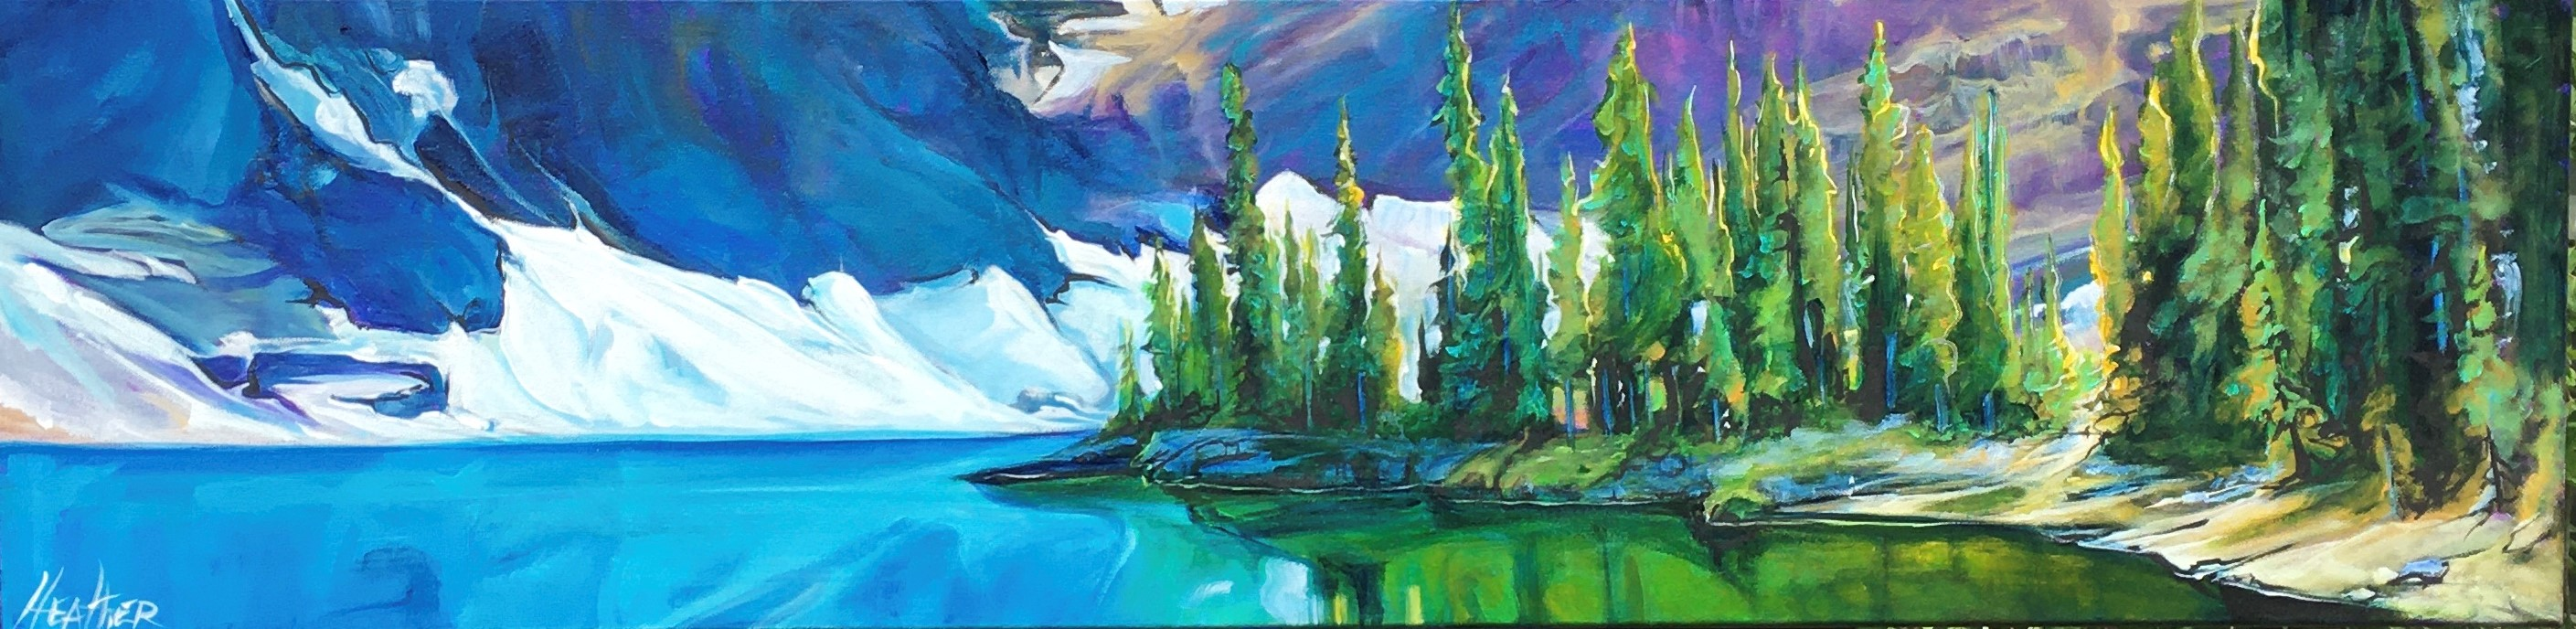 Floe Lake 12 x 48 Acrylics on Canvas SOLD